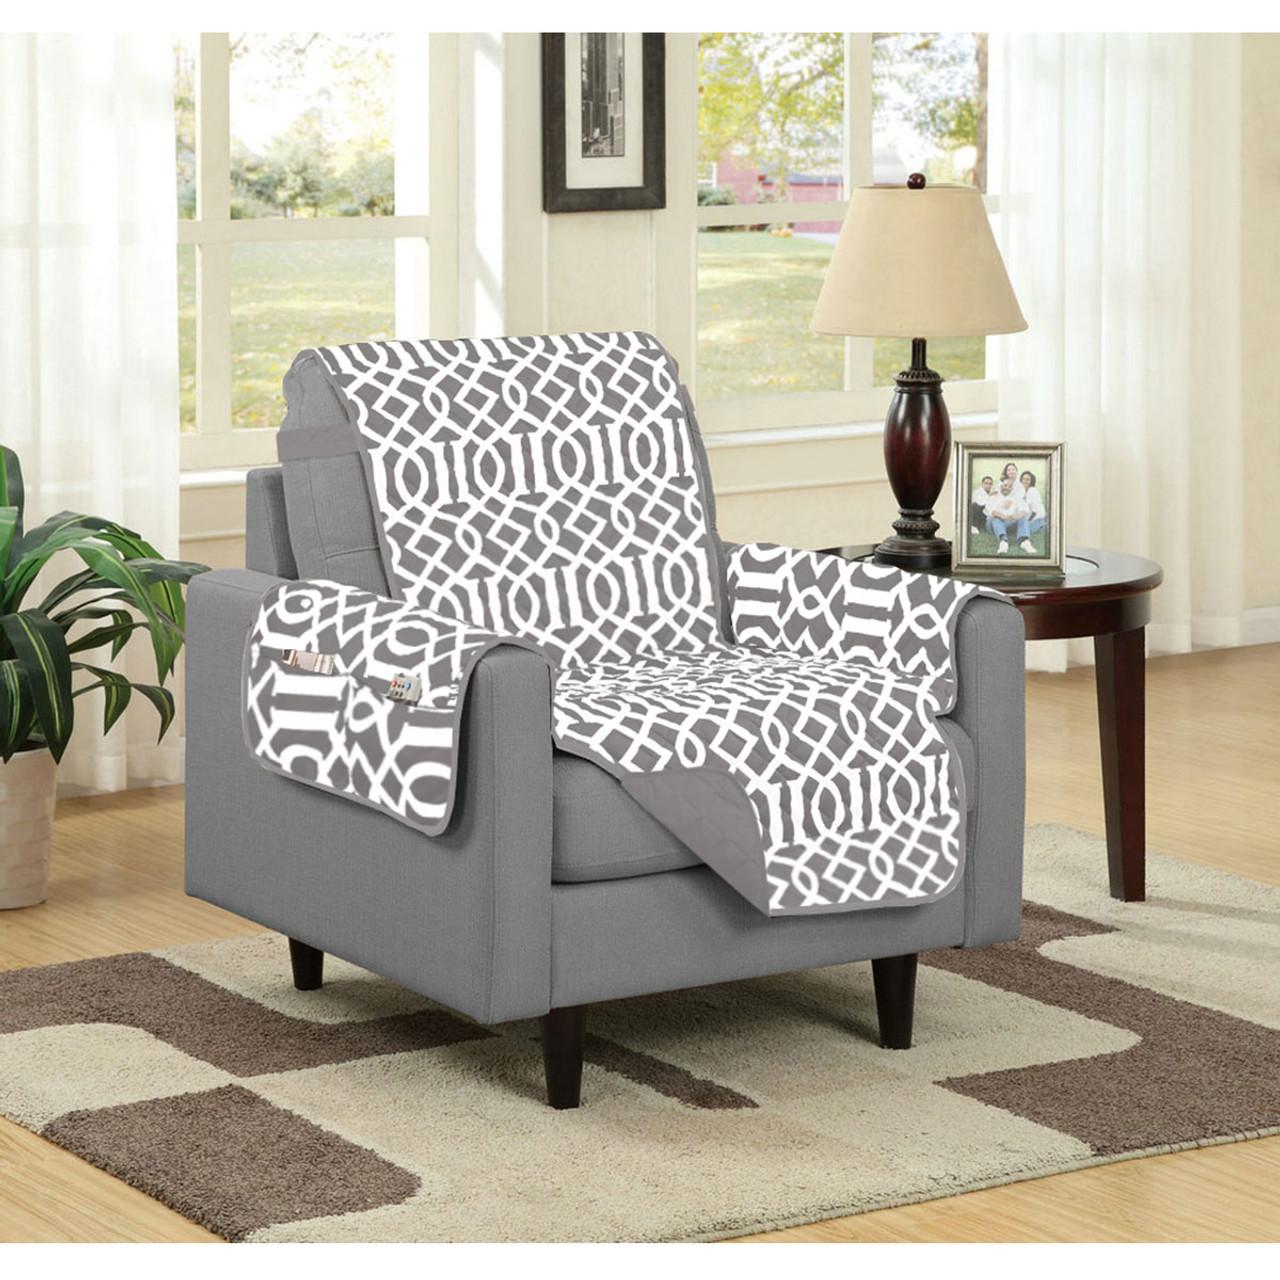 Attractive Dallas Reversible Solid/Print Microfiber Furniture Protector With Strap U0026  Side Pockets